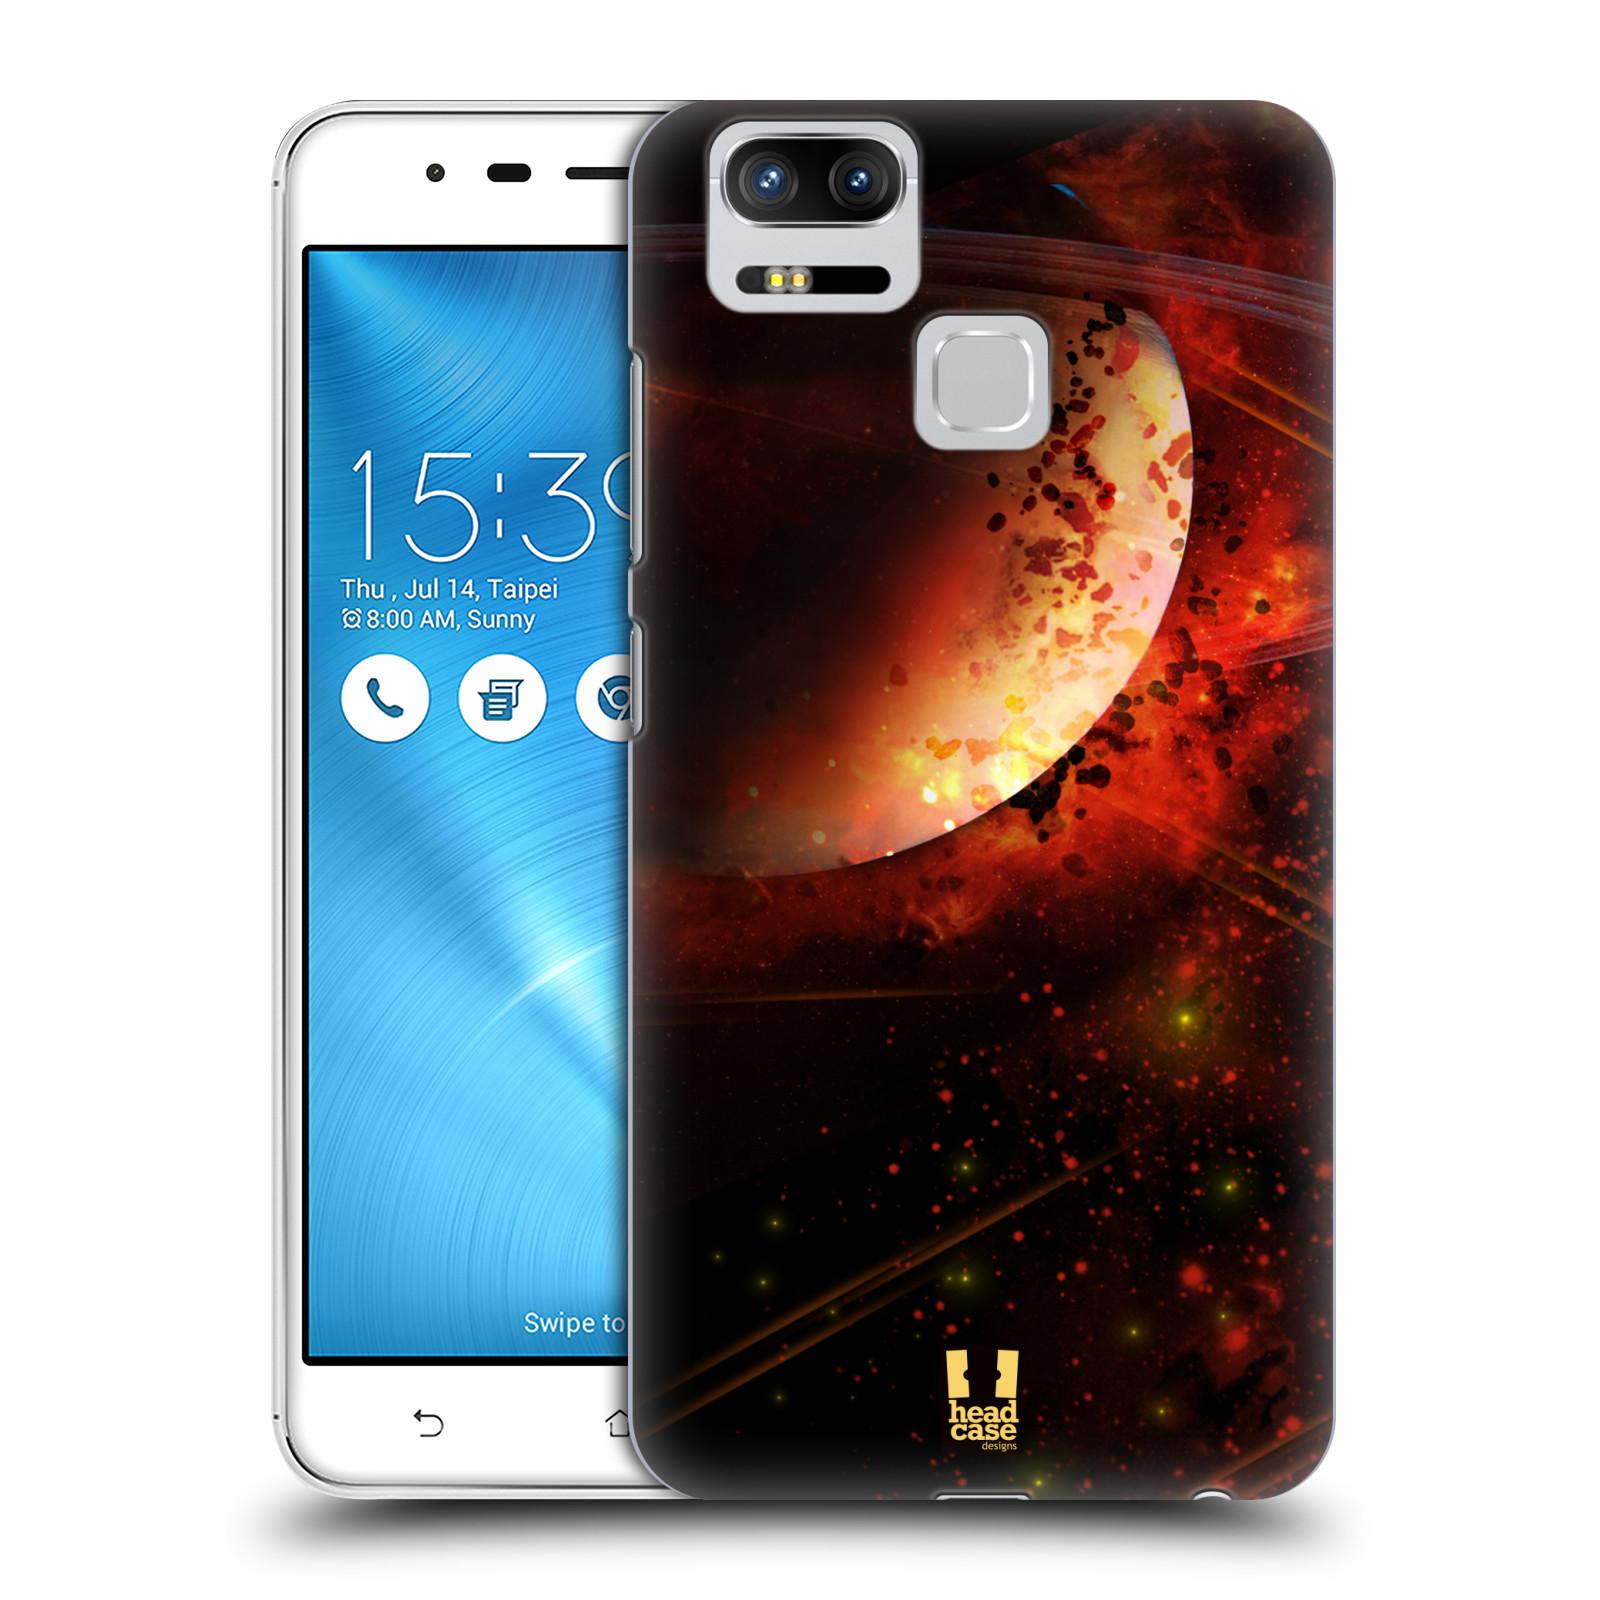 Plastové pouzdro na mobil Asus ZenFone 3 ZOOM ZE553KL - Head Case - SATURN (Plastový kryt či obal na mobilní telefon Asus ZenFone 3 ZOOM ZE553KL s motivem SATURN)